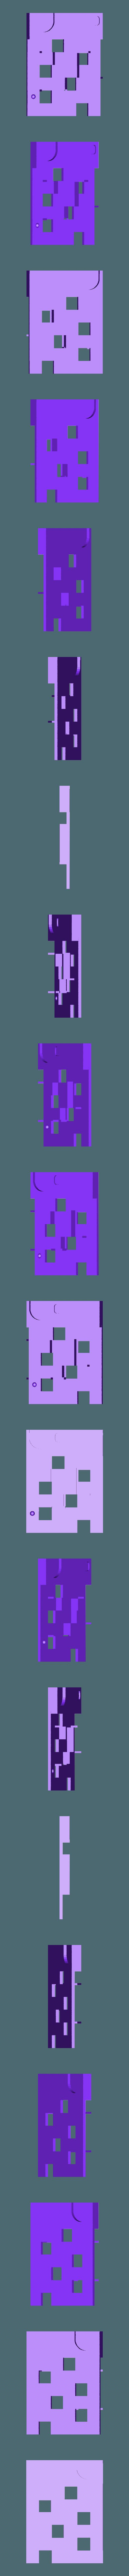 Game Card_CHEESERUN.stl Download free STL file The MARBLE BOY • 3D printing model, Janis_Bruchwalski